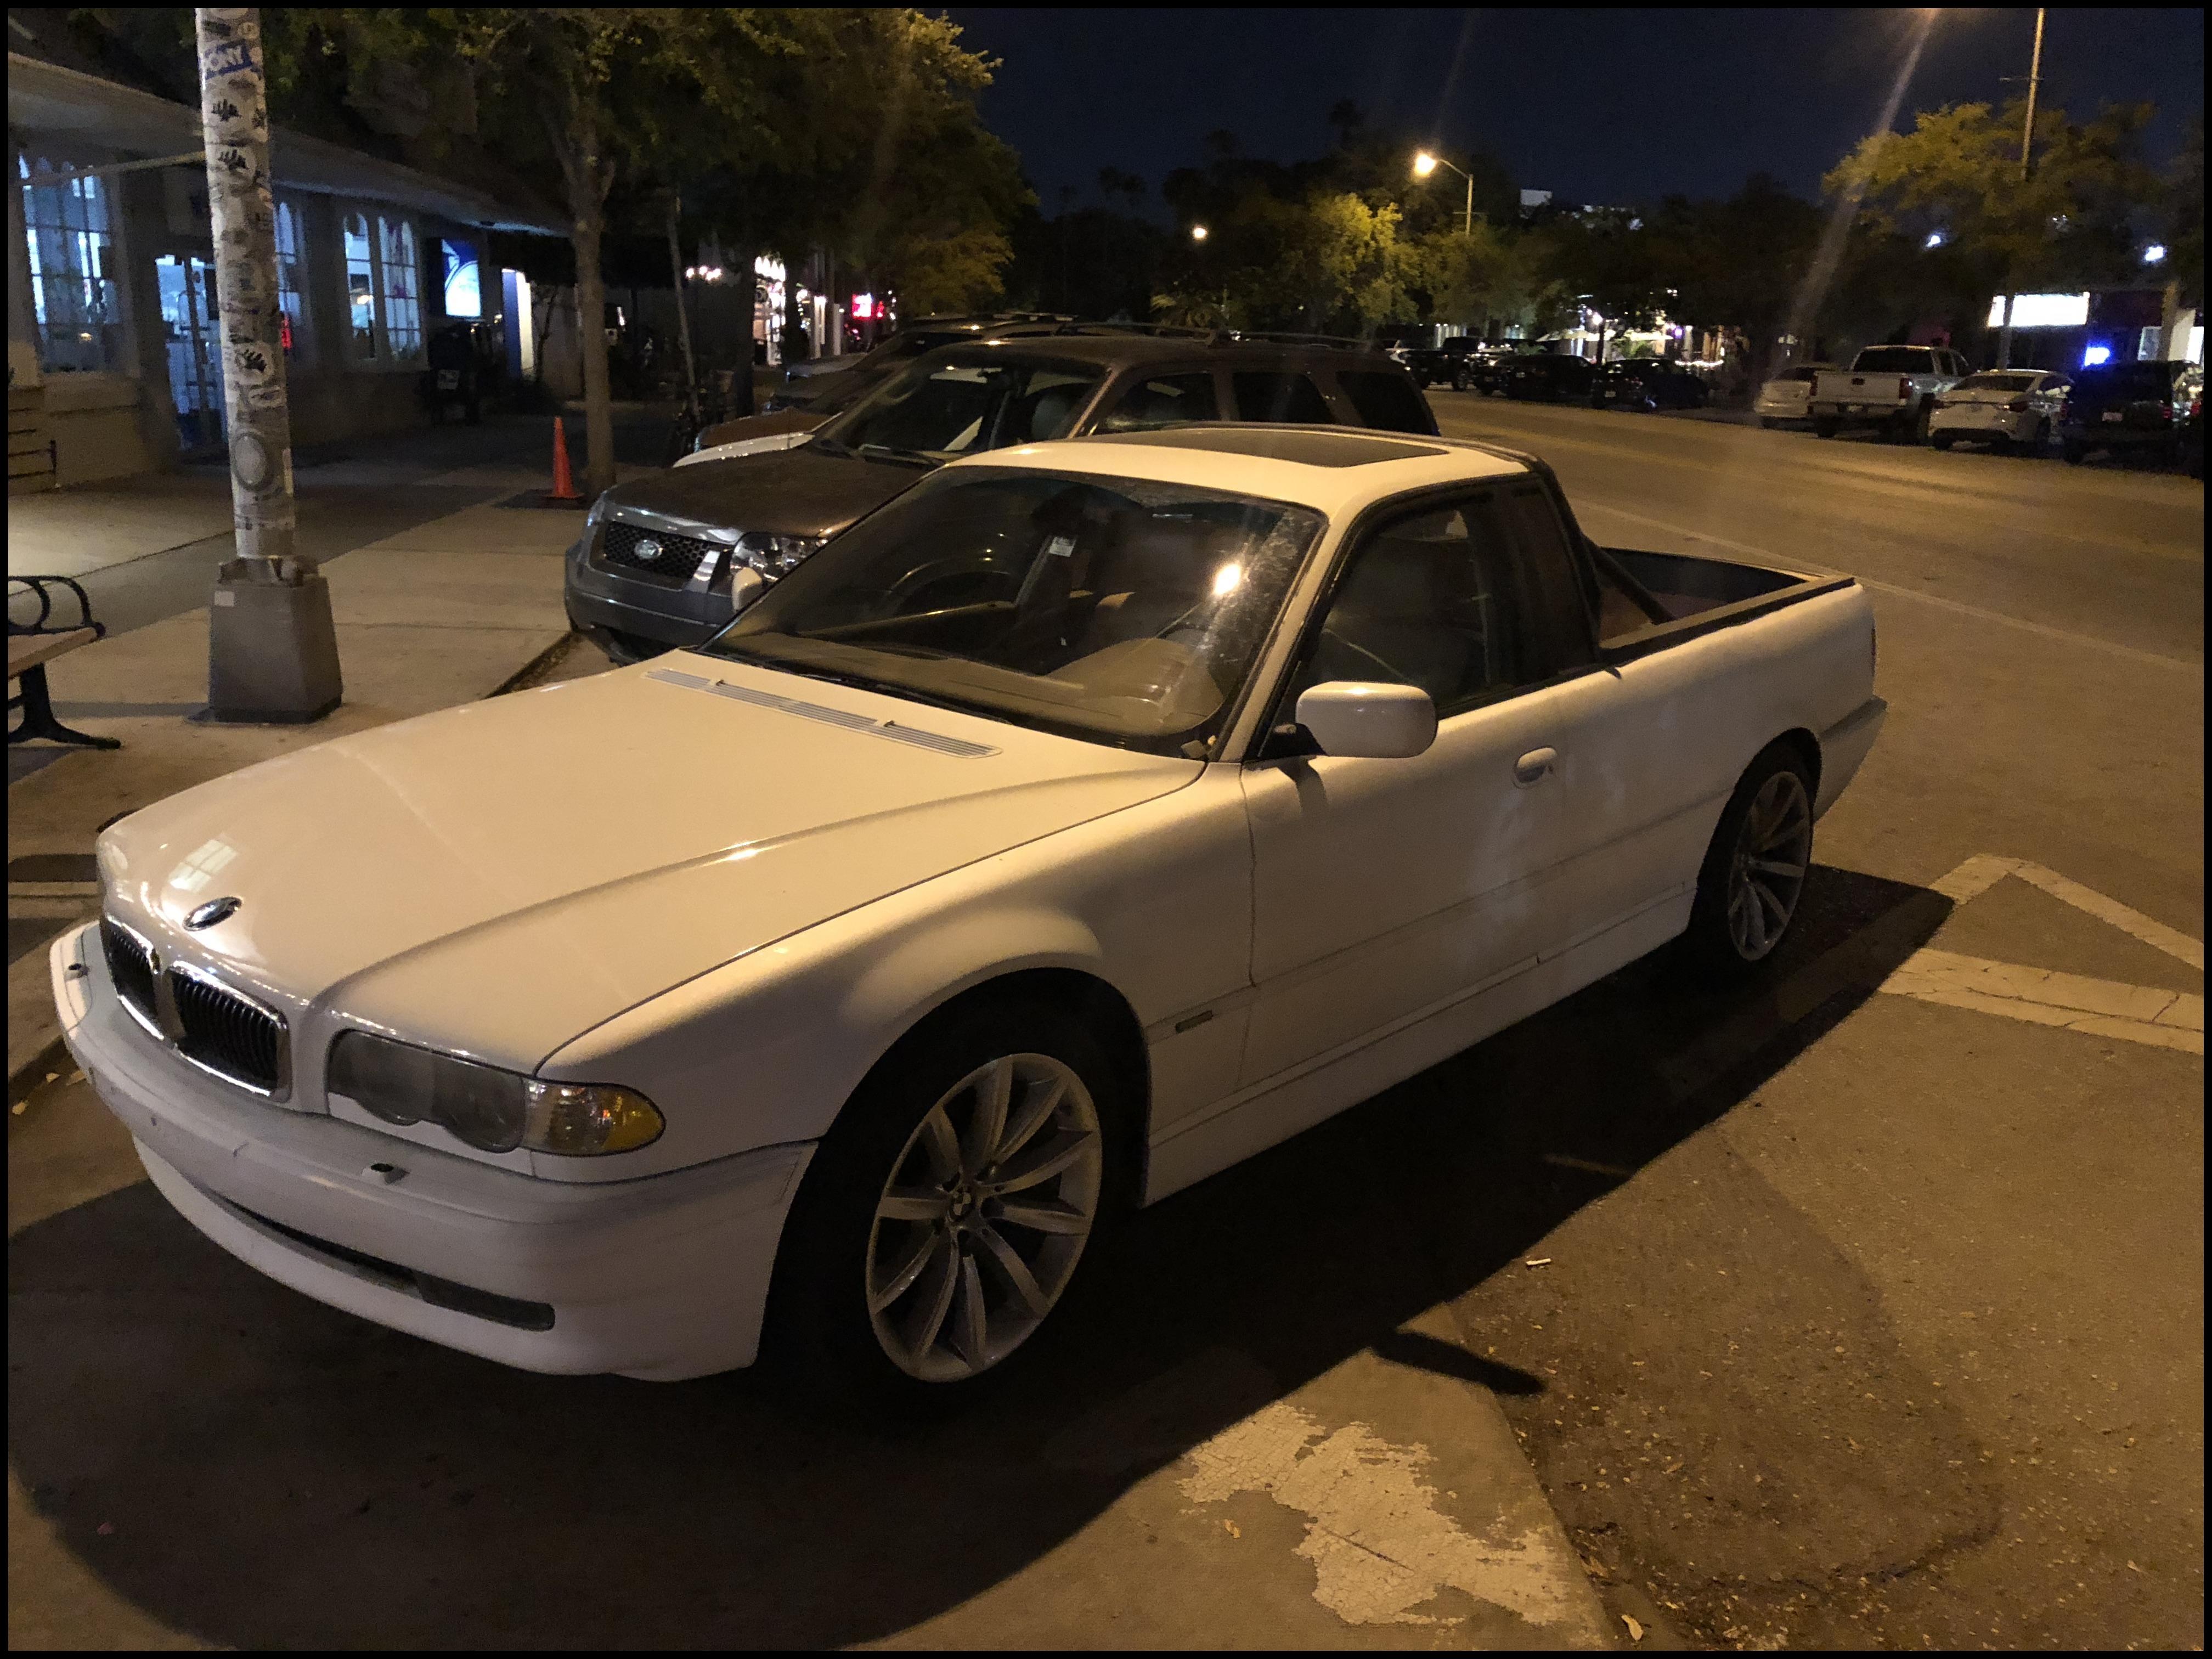 Classy redneck BMW 7 series El